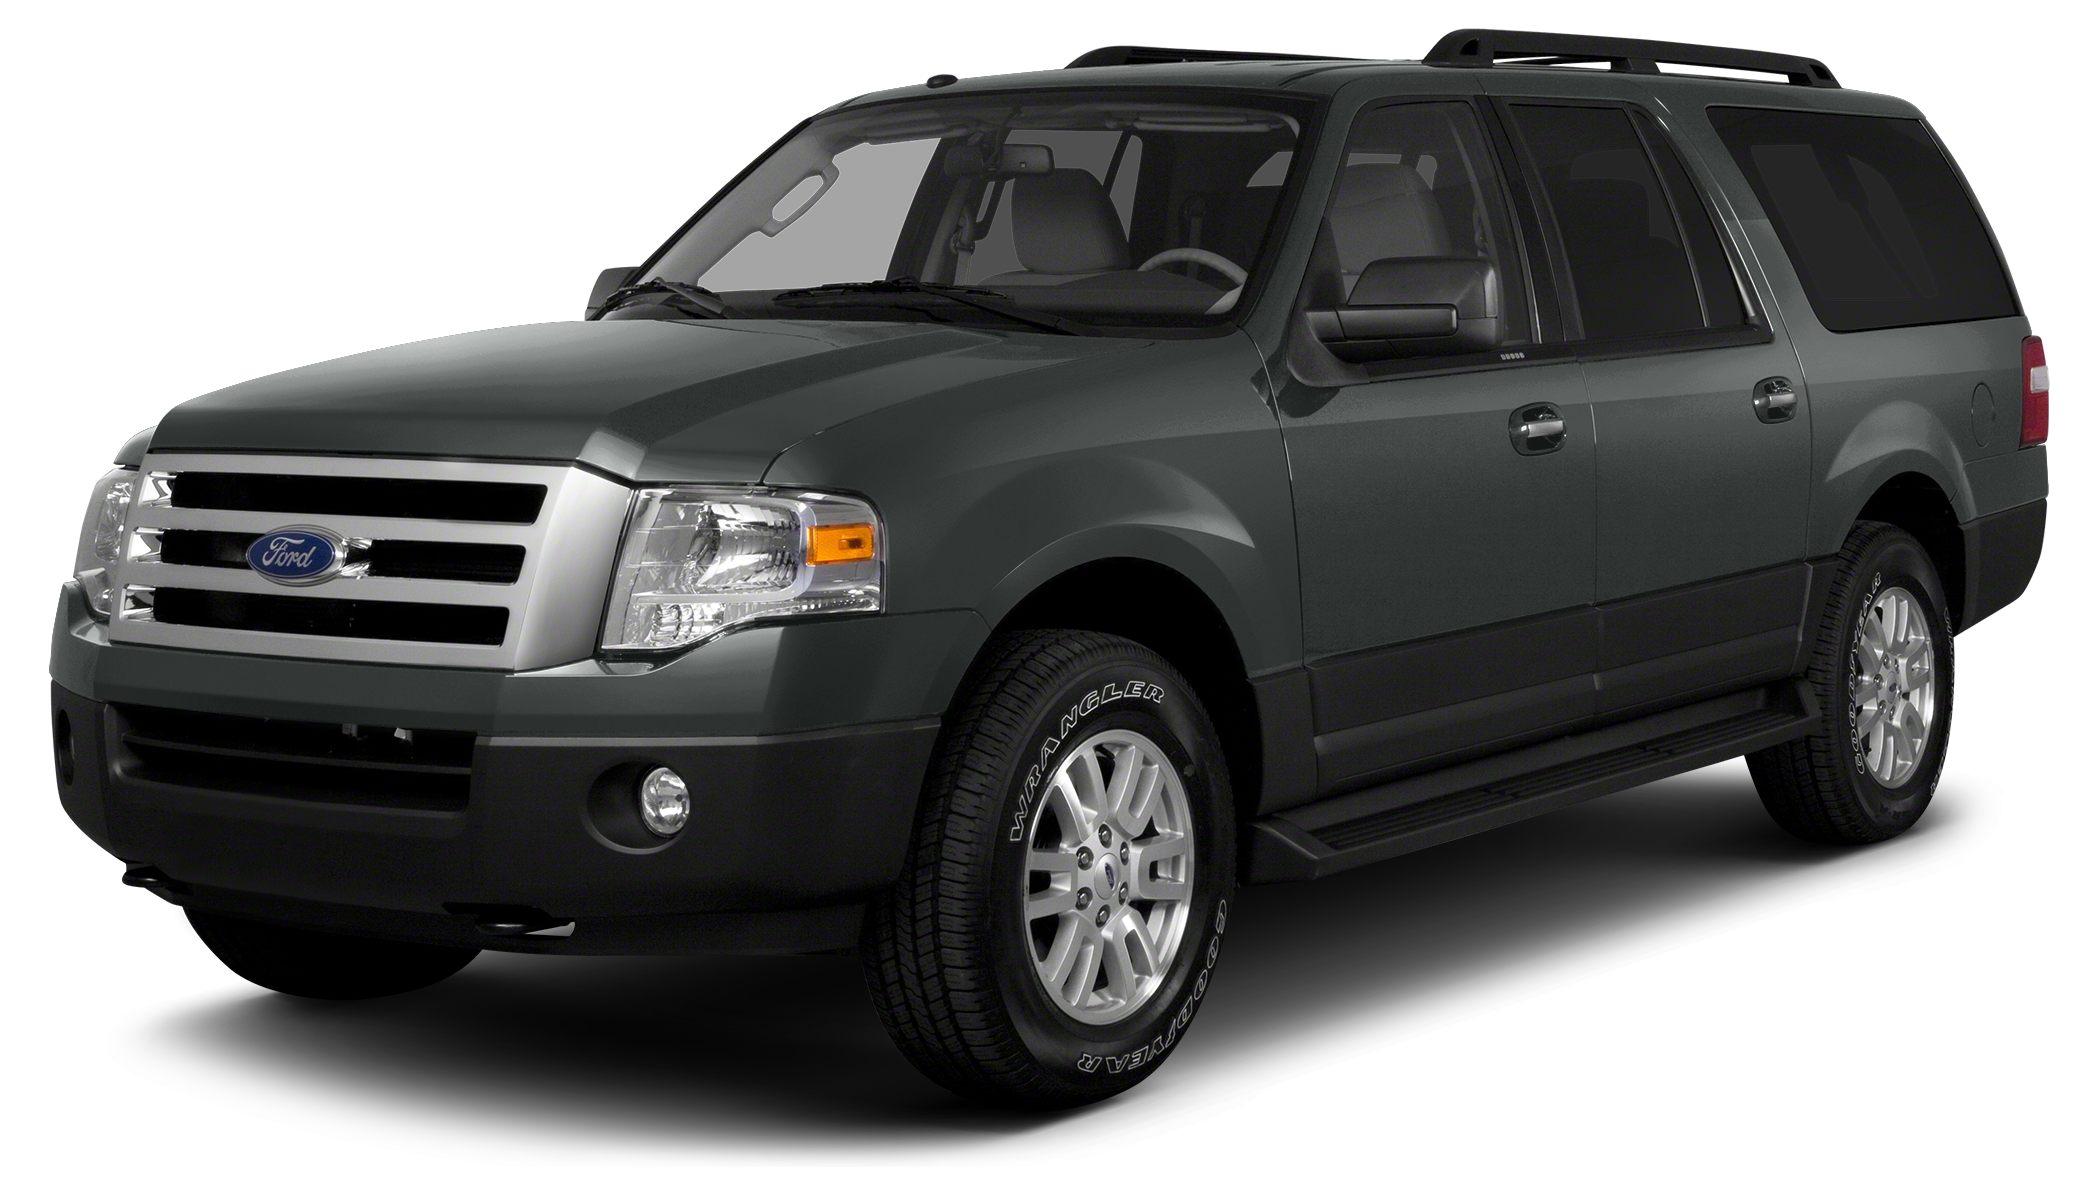 2014 Ford Expedition EL Limited Miles 34876Color Sterling Gray Stock FG2895A VIN 1FMJK1K58EE